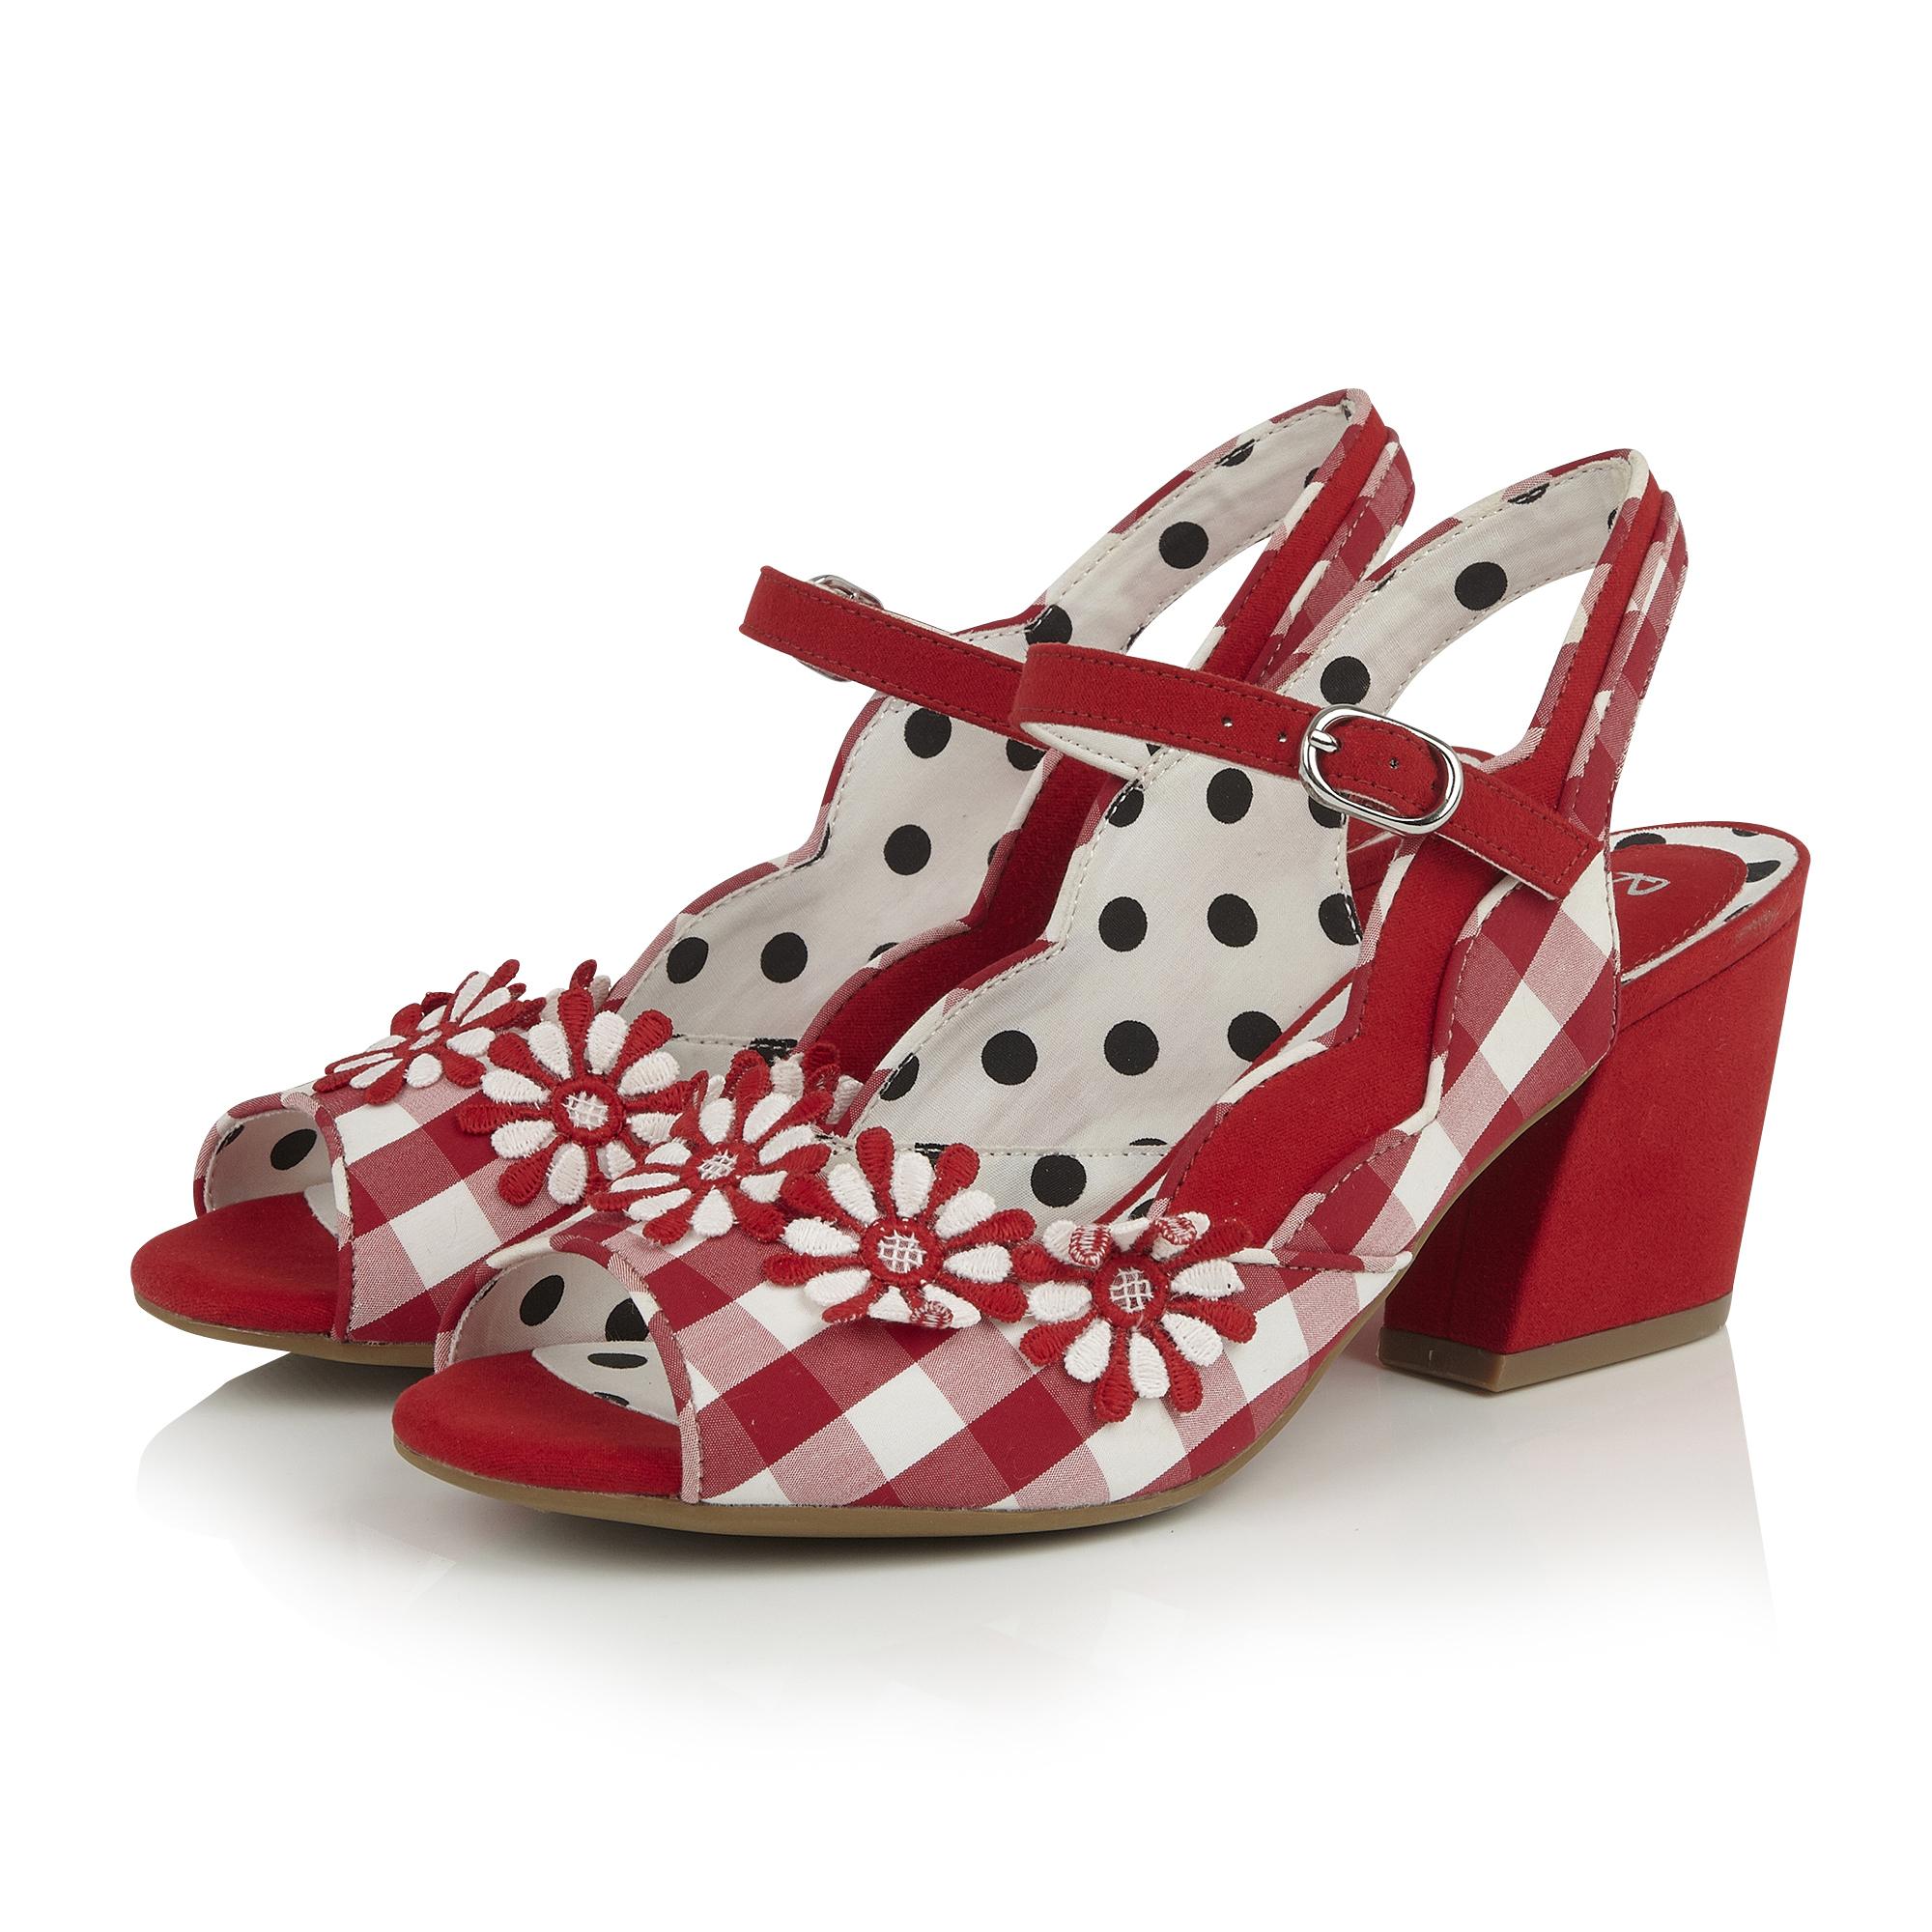 33e4f1b430f Details about Ruby Shoo Hera Gingham Block Heel Peeptoe Sandals & Matching  Mendoza Bag UK 2-9